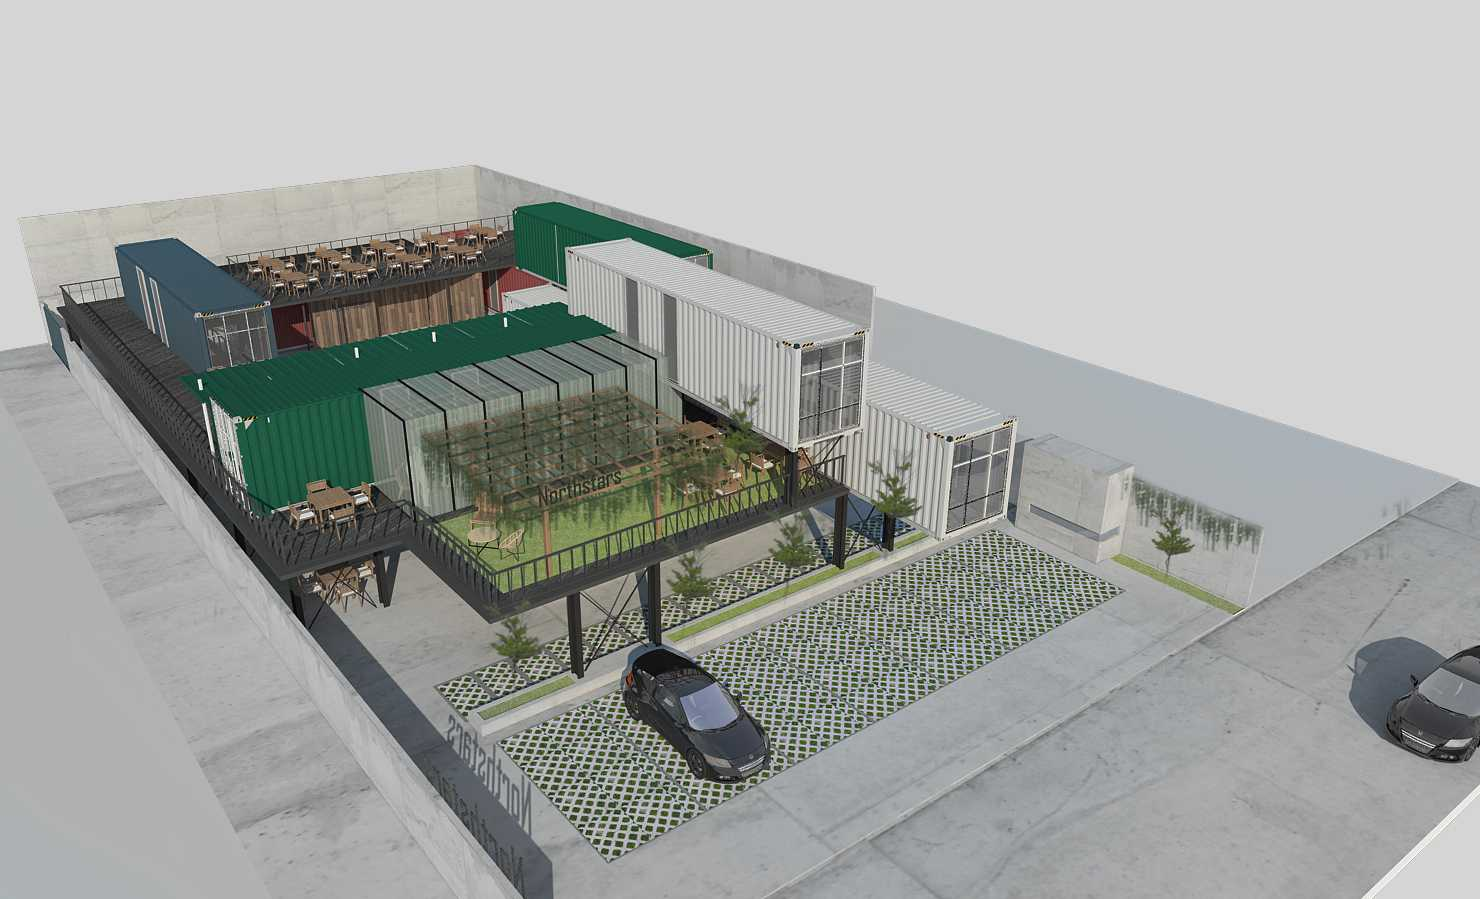 Braun Studio Northstars Cafe Medan Jl. Jamin Ginting, Padang Bulan, Medan Baru, Kota Medan, Sumatera Utara 20157, Indonesia Medan Sisingamangaraja Bird Eye View Industrial 25852